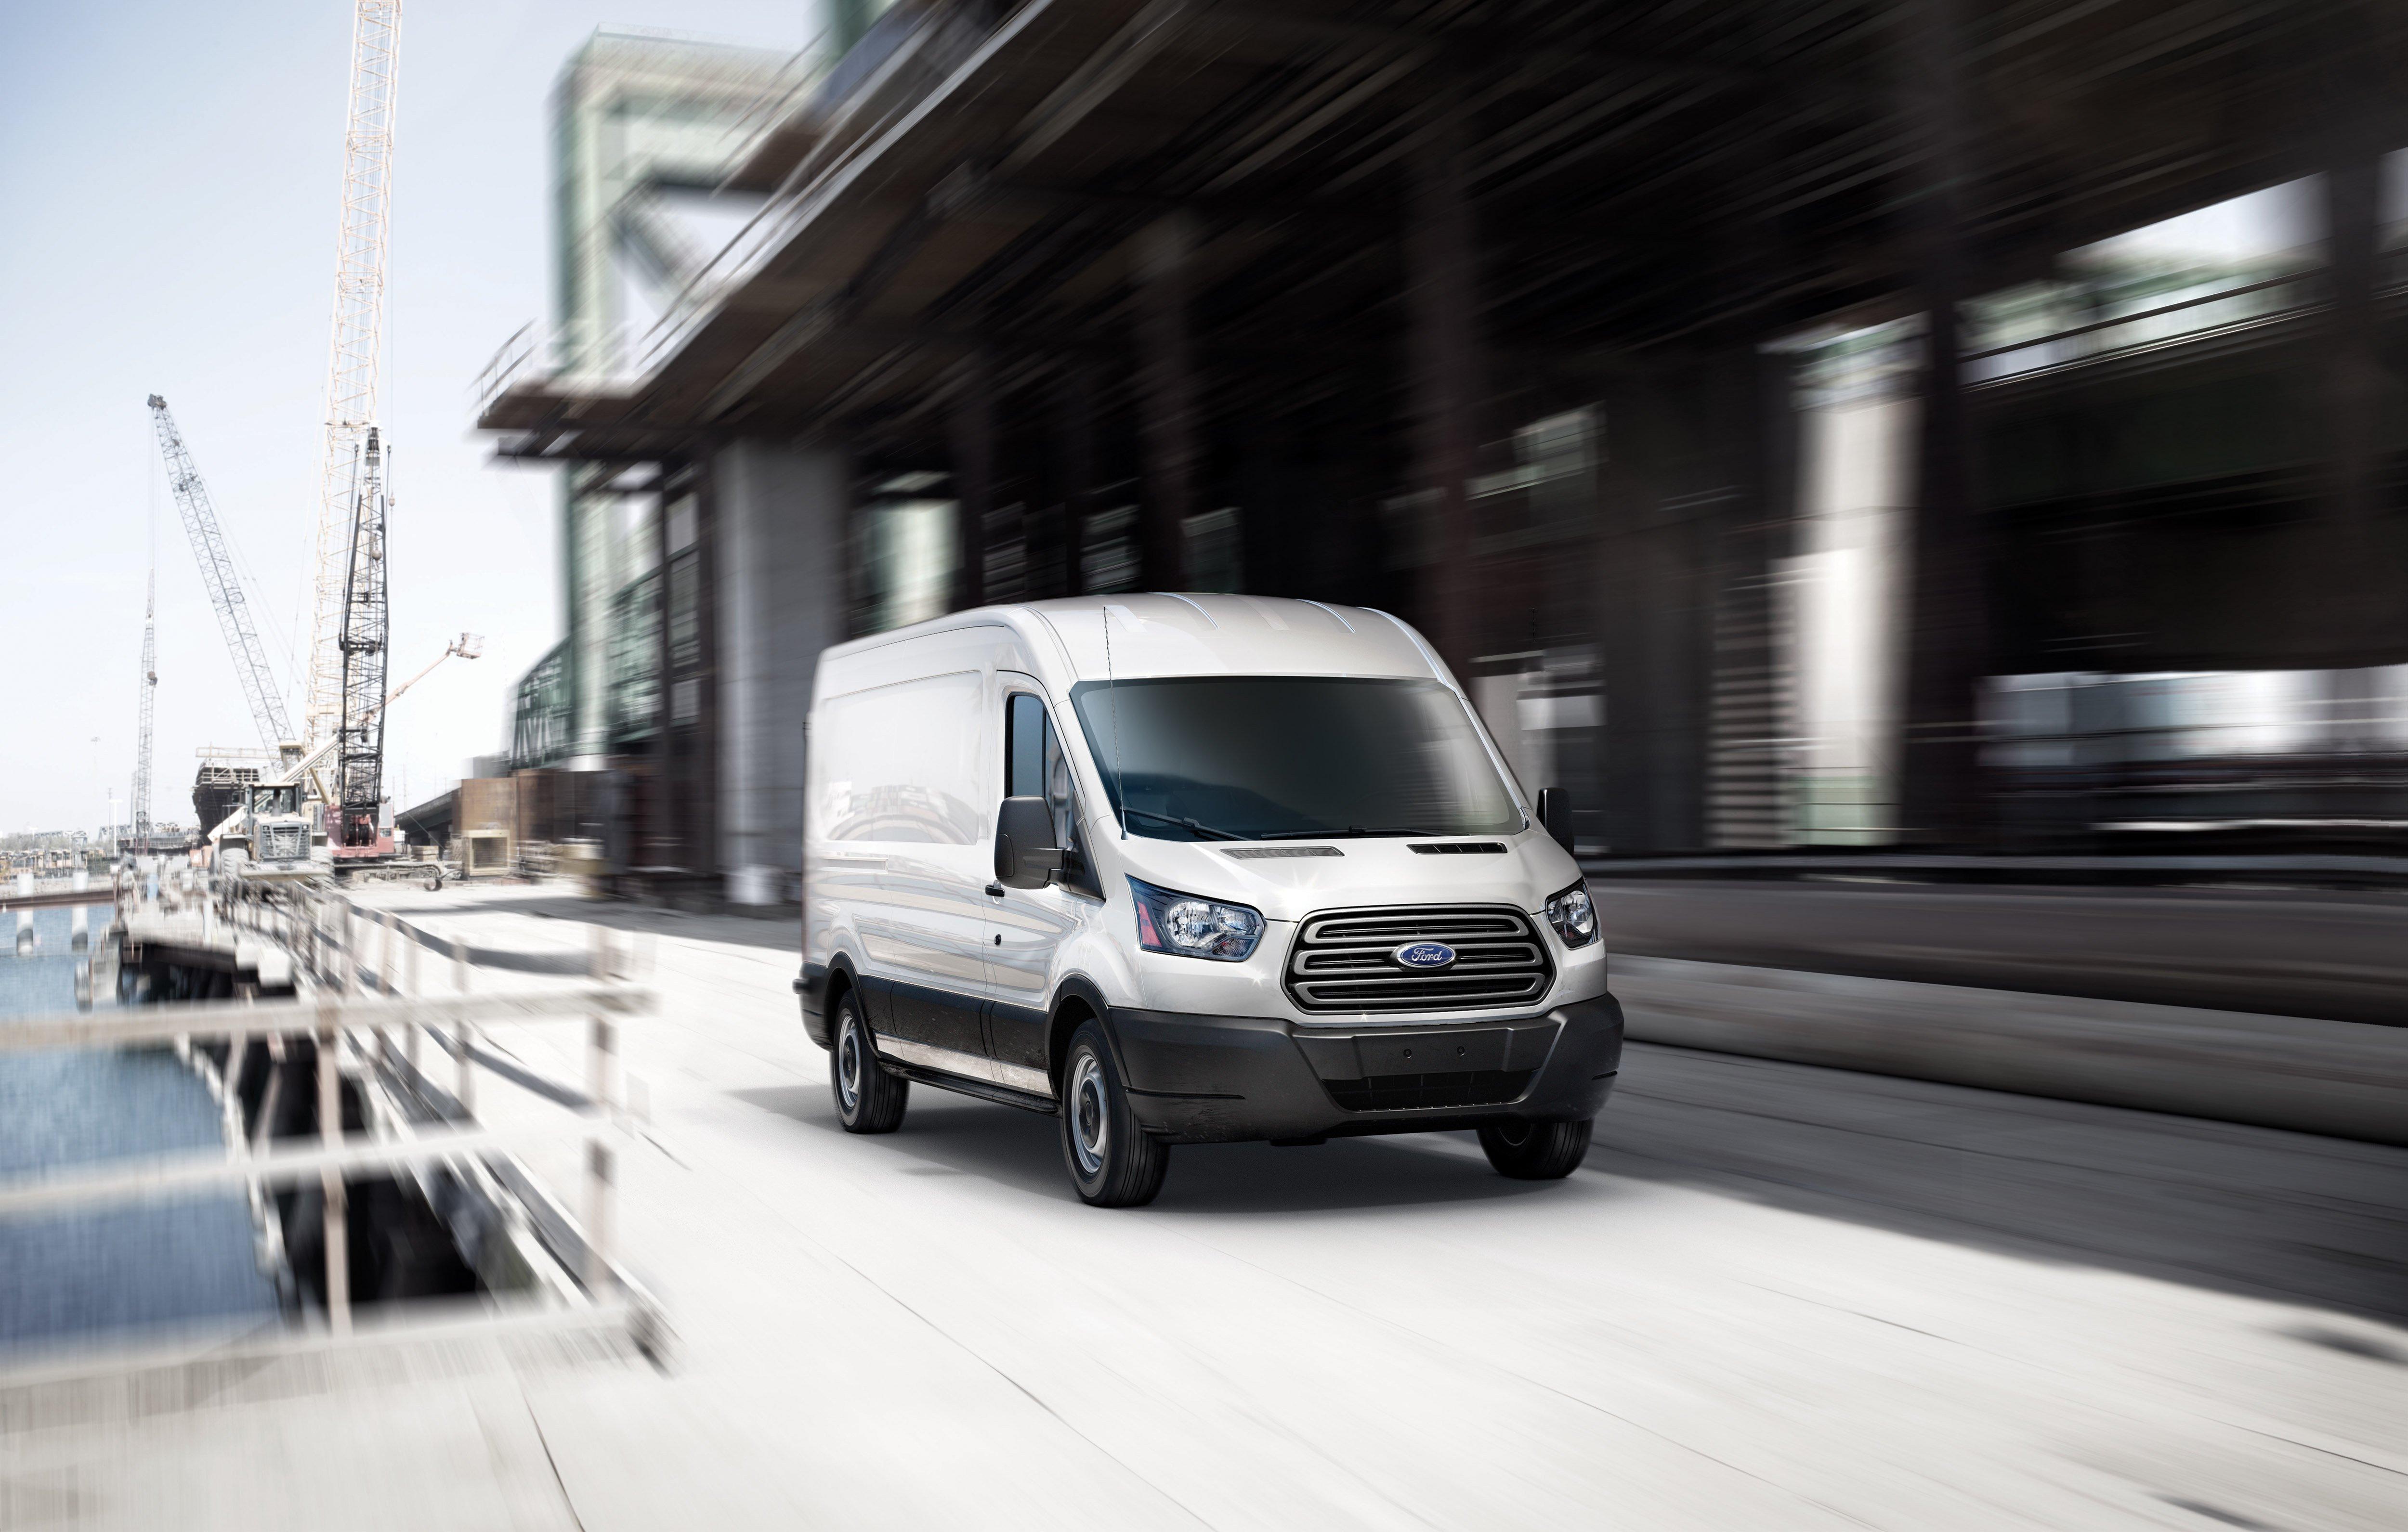 Ford Recalls Transit Vans for Air Bags